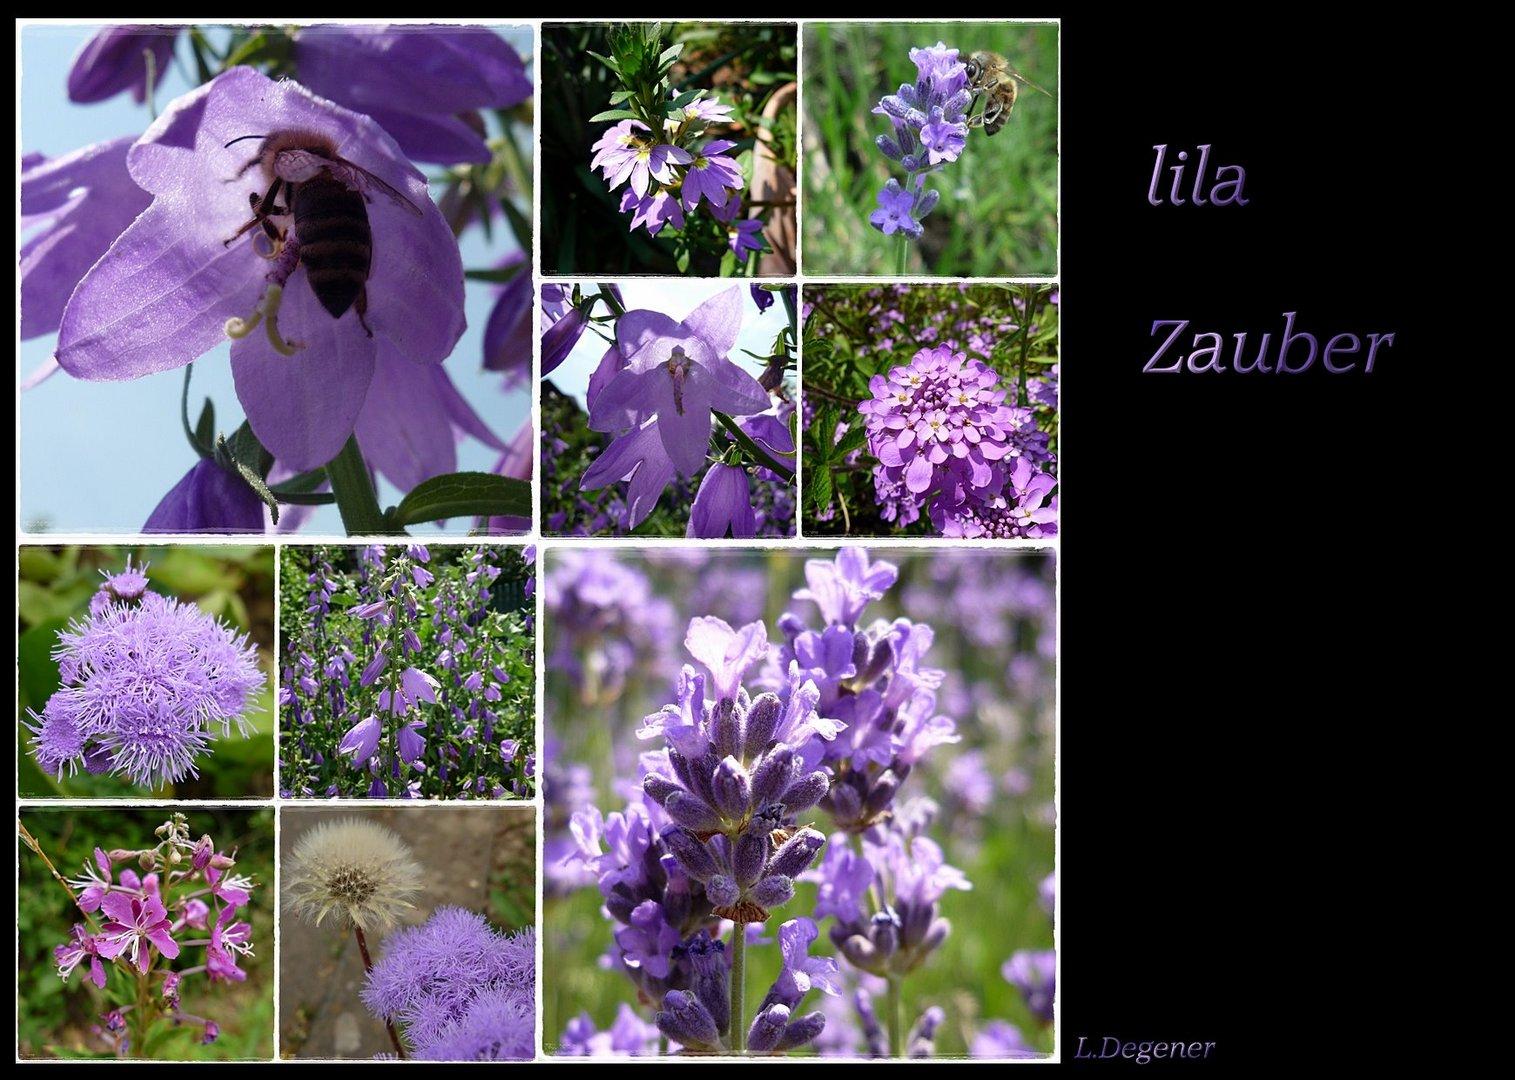 lila Zauber